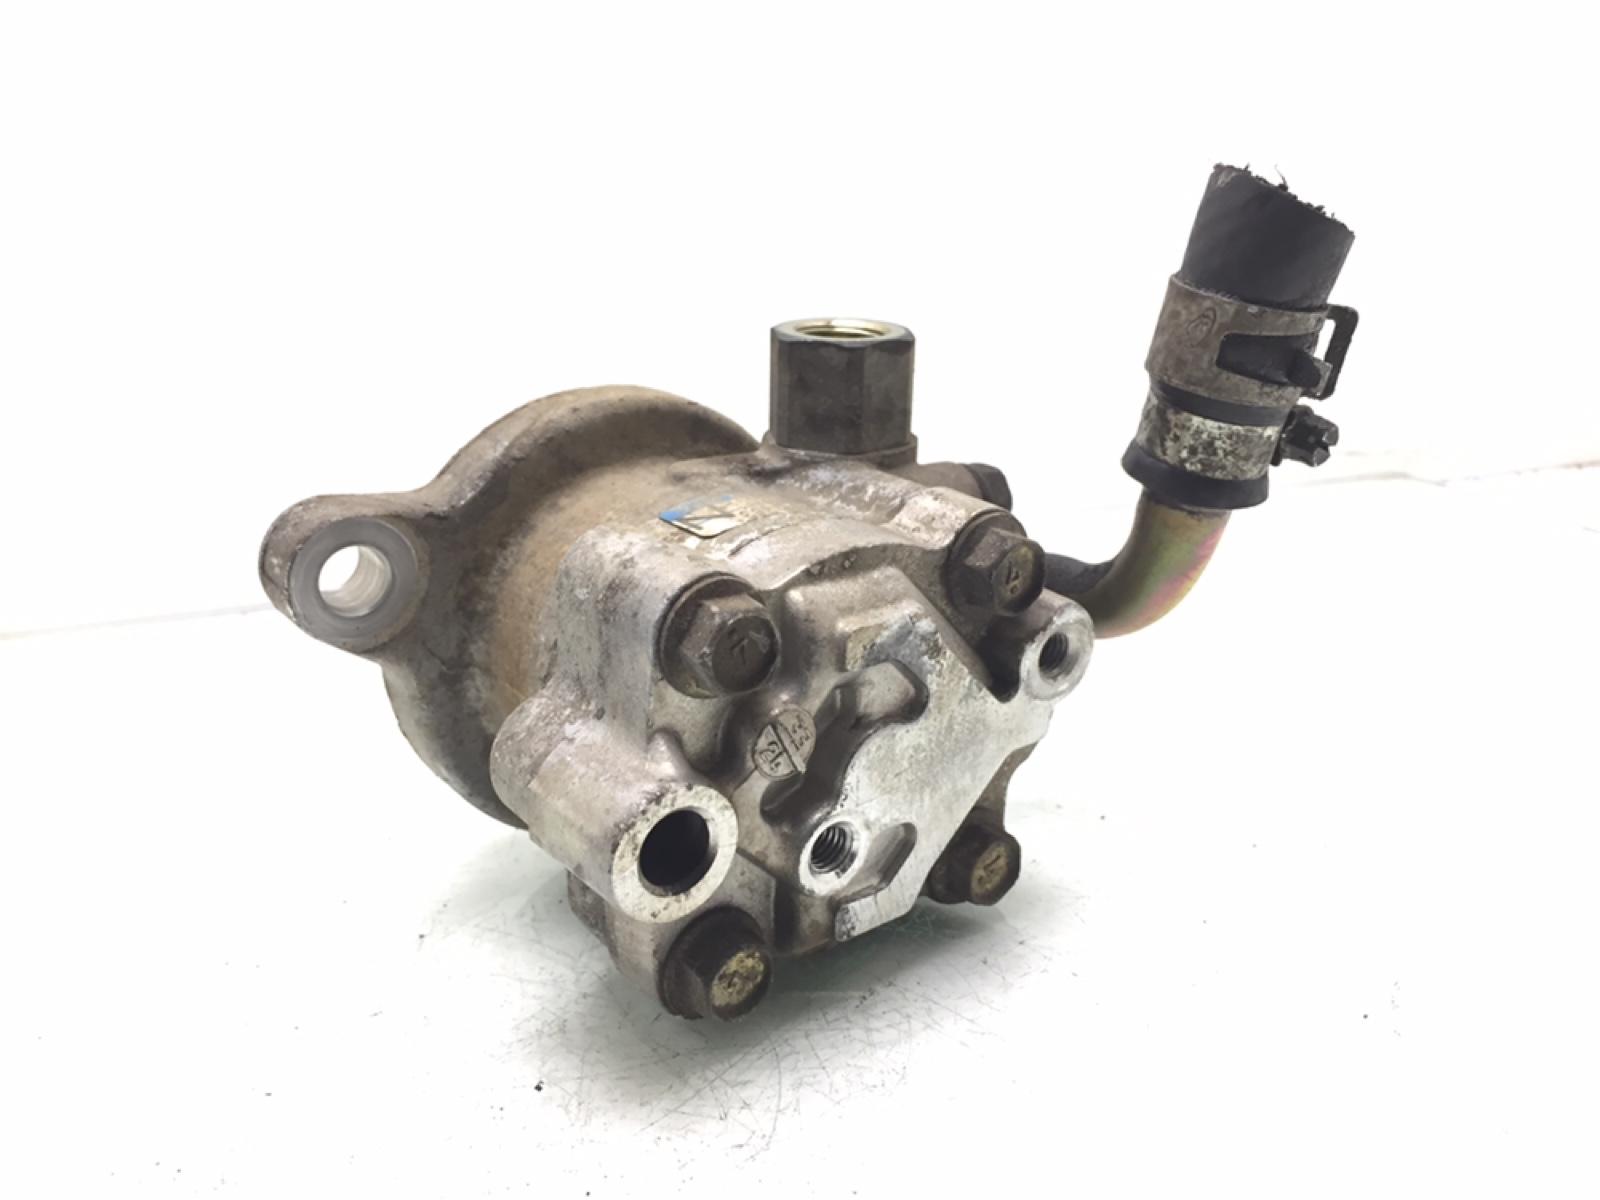 Насос гидроусилителя руля Nissan Almera Tino 2.2 DCI 2003 (б/у)